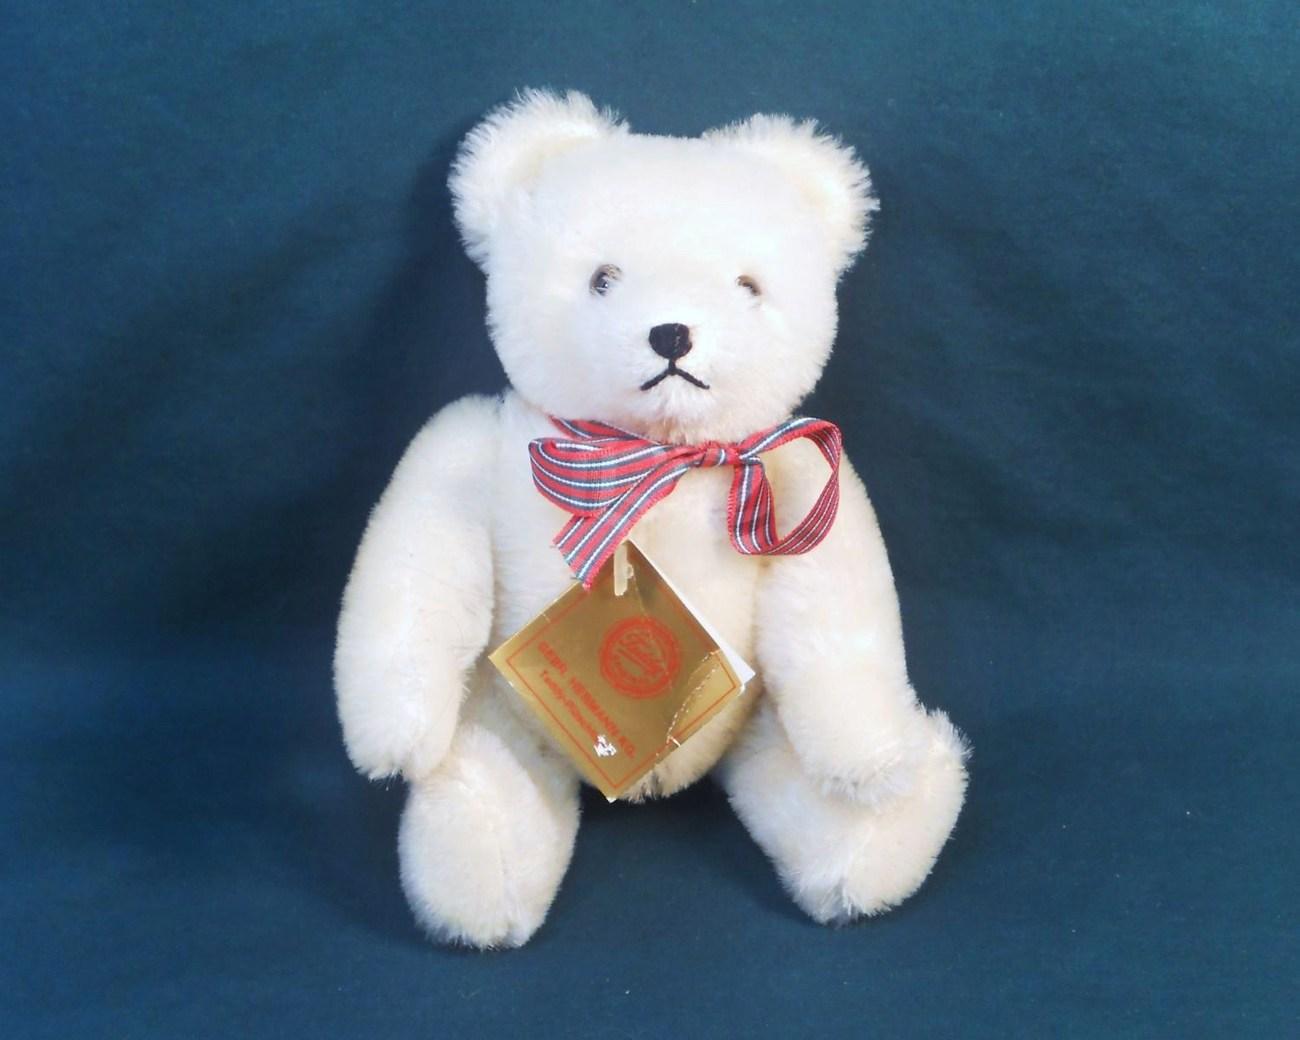 Gebr-Hermann Teddy Bear Original 7 inch for P&E Rubin 1985